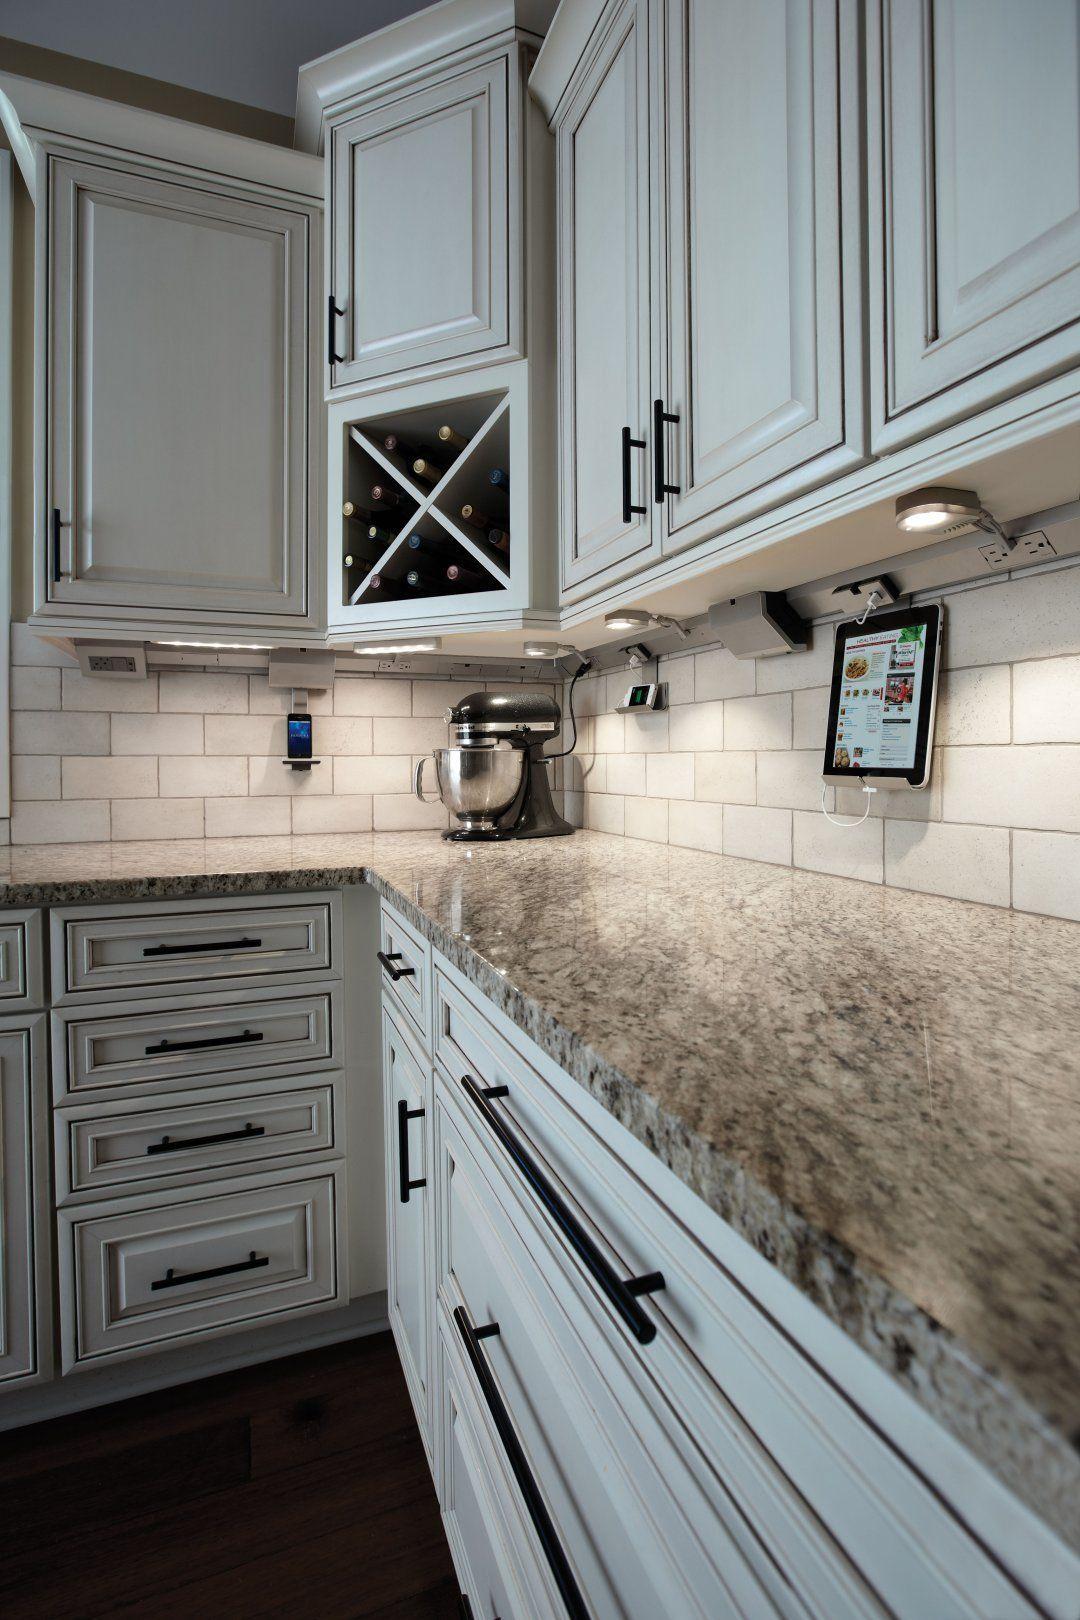 Shop 18 Inch Modular Track By Legrand Adorne Led Linear Light By Legrand Adorne Mobile Phone Cradle By Upper Kitchen Cabinets Kitchen Design Kitchen Remodel